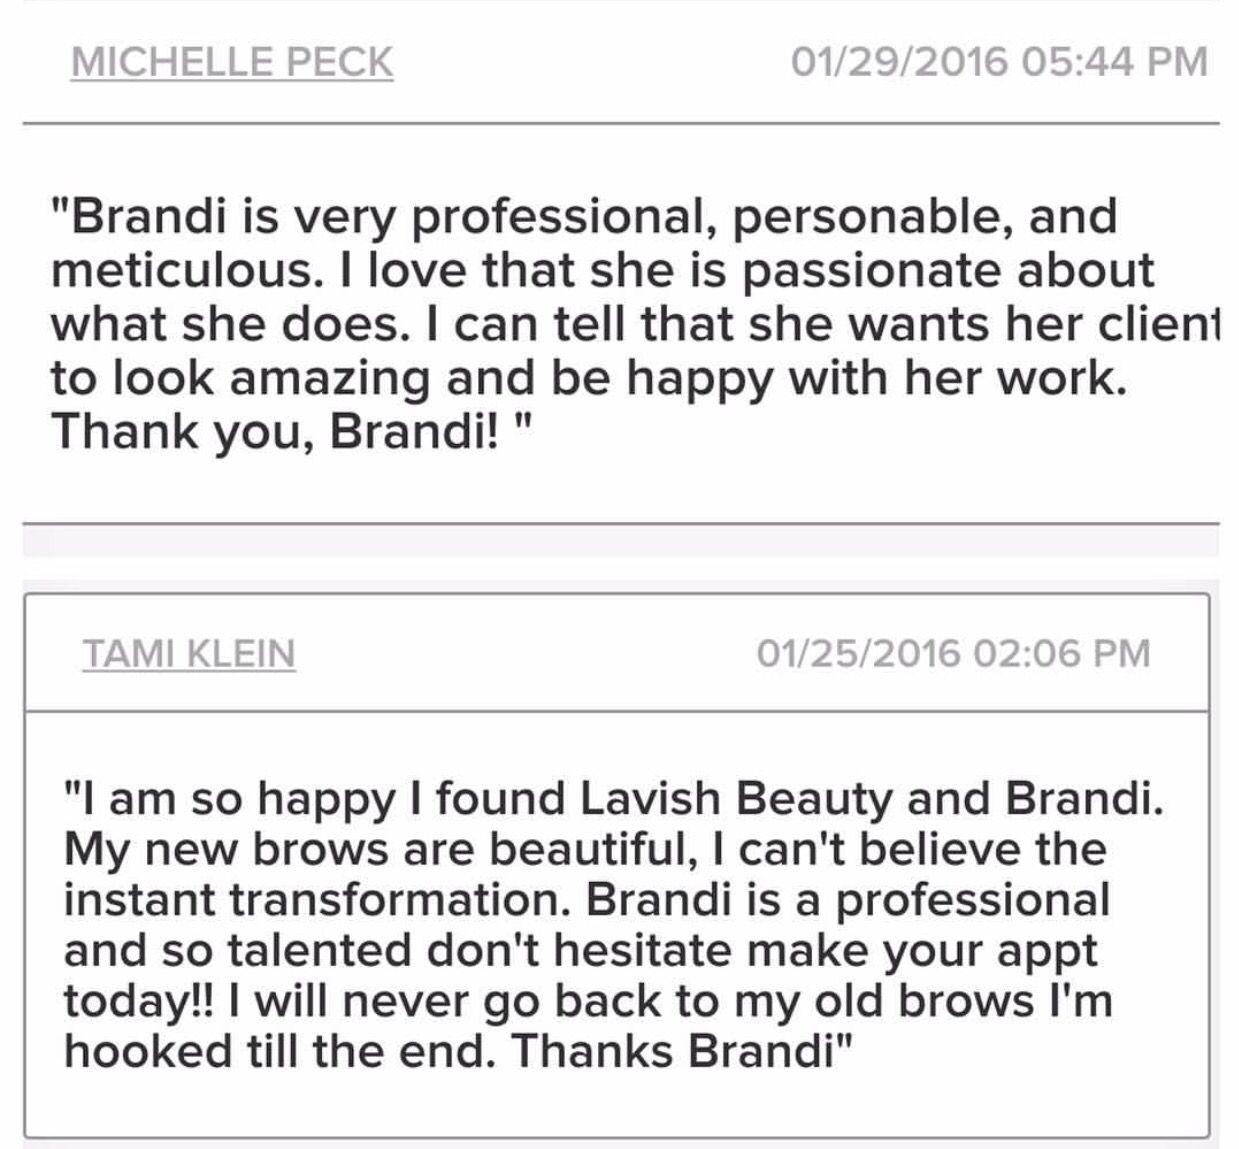 www.lavishbeauty.us microblading lavishbeauty My love